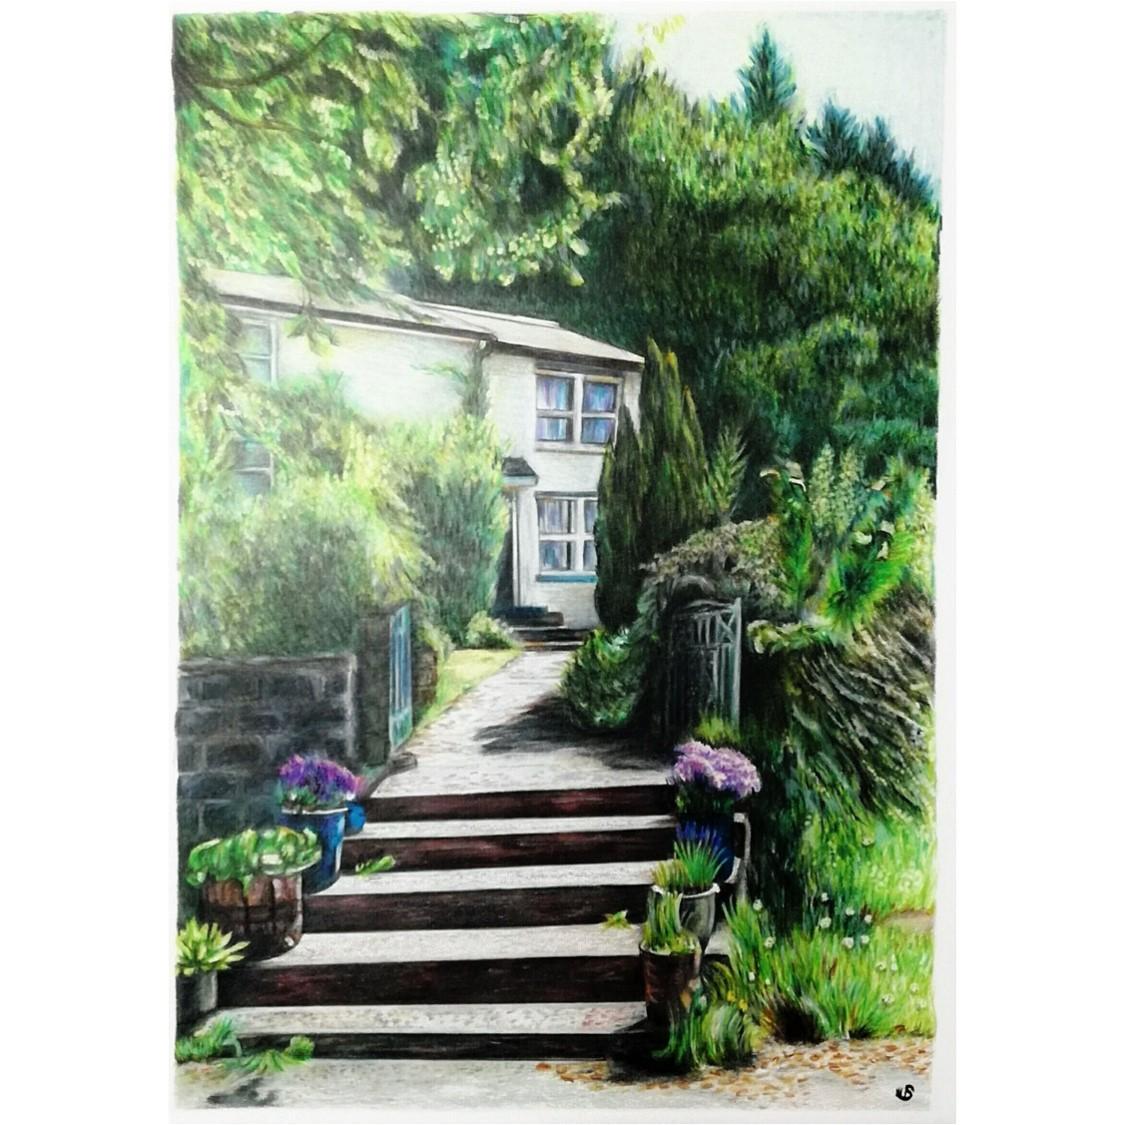 'Aberteweran Farm' - UK, 8.3 x 11.7 inches, 2016, Colour Pencil Landscape of a Farm in Wales